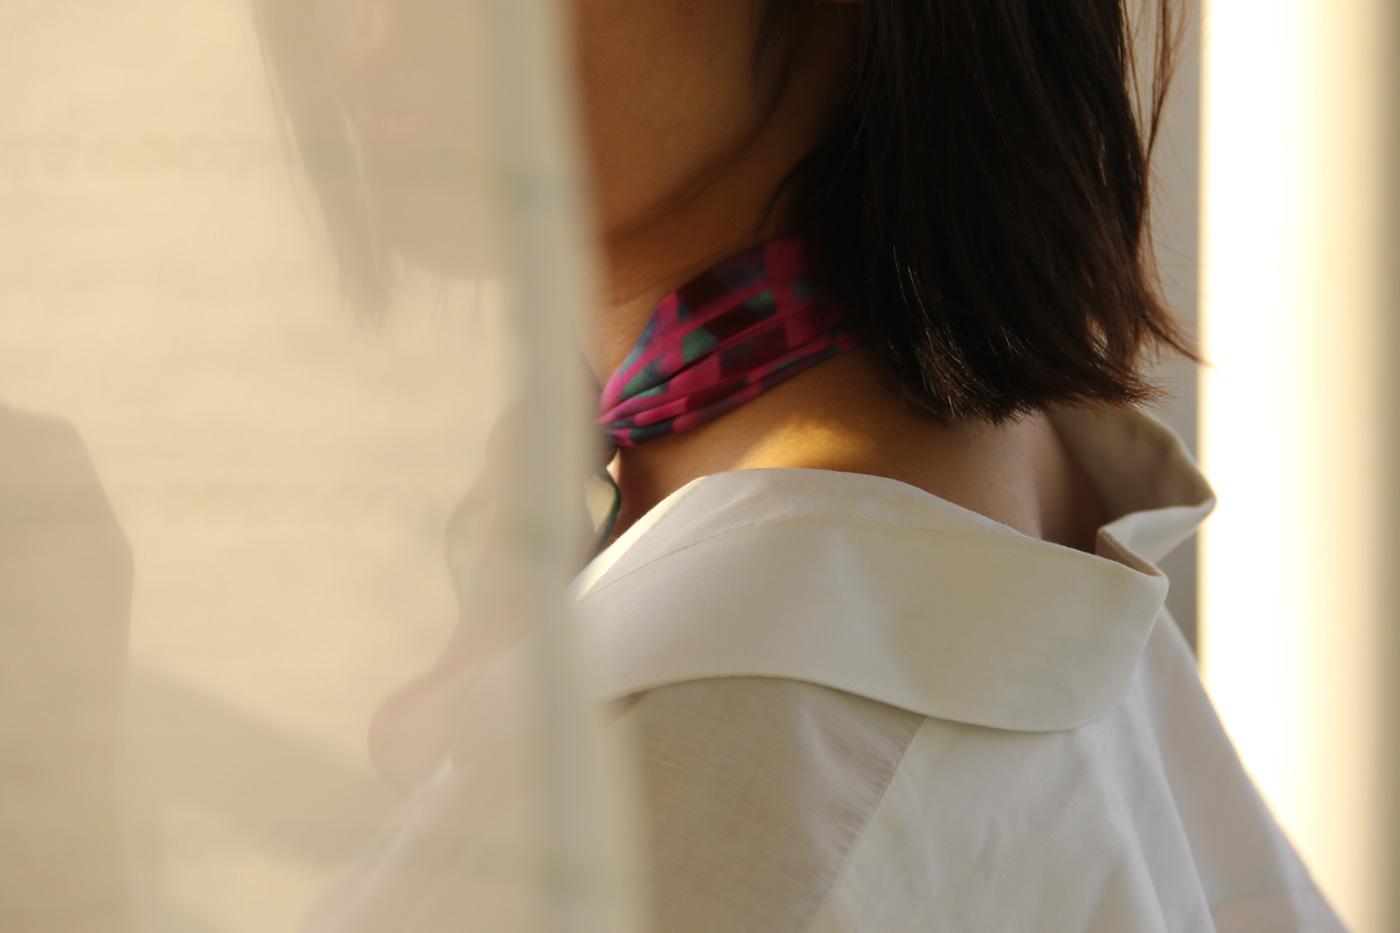 buy pink fashion silk scarf online in taipei tokyo paris. スカーフコーデ by bambi watanabe; isetan selfridges barneys new york